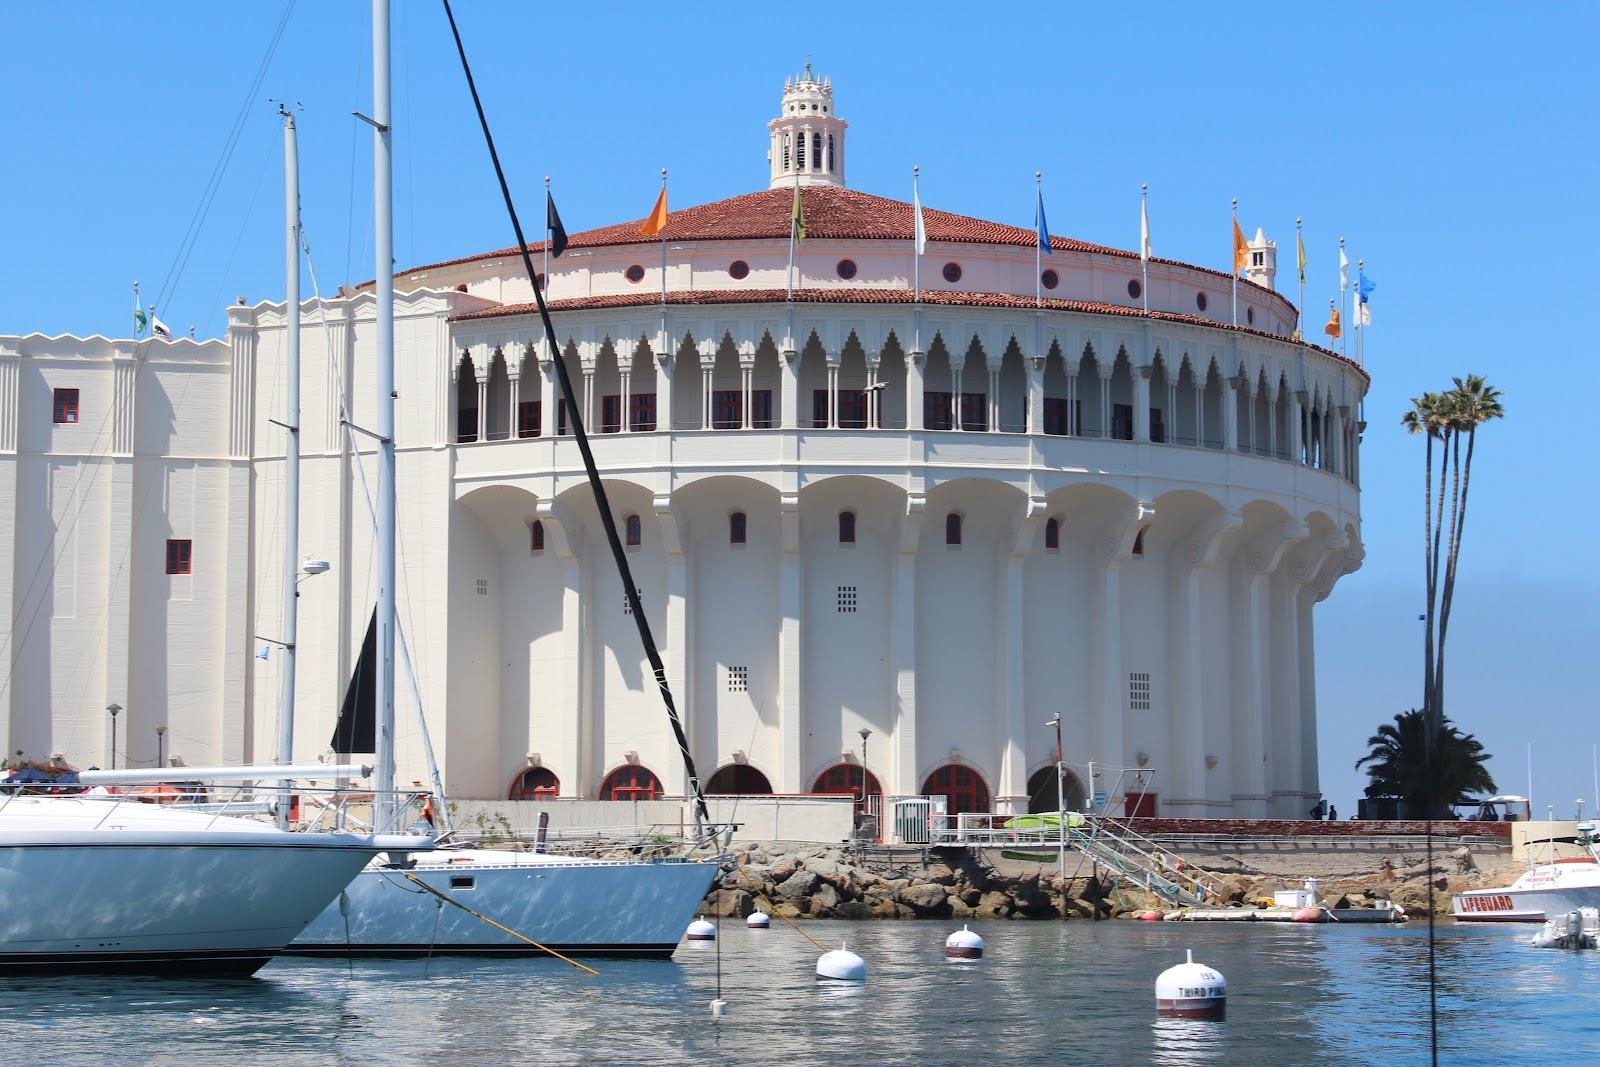 Catalina island flyer kroq catalina island concert june for The catalina